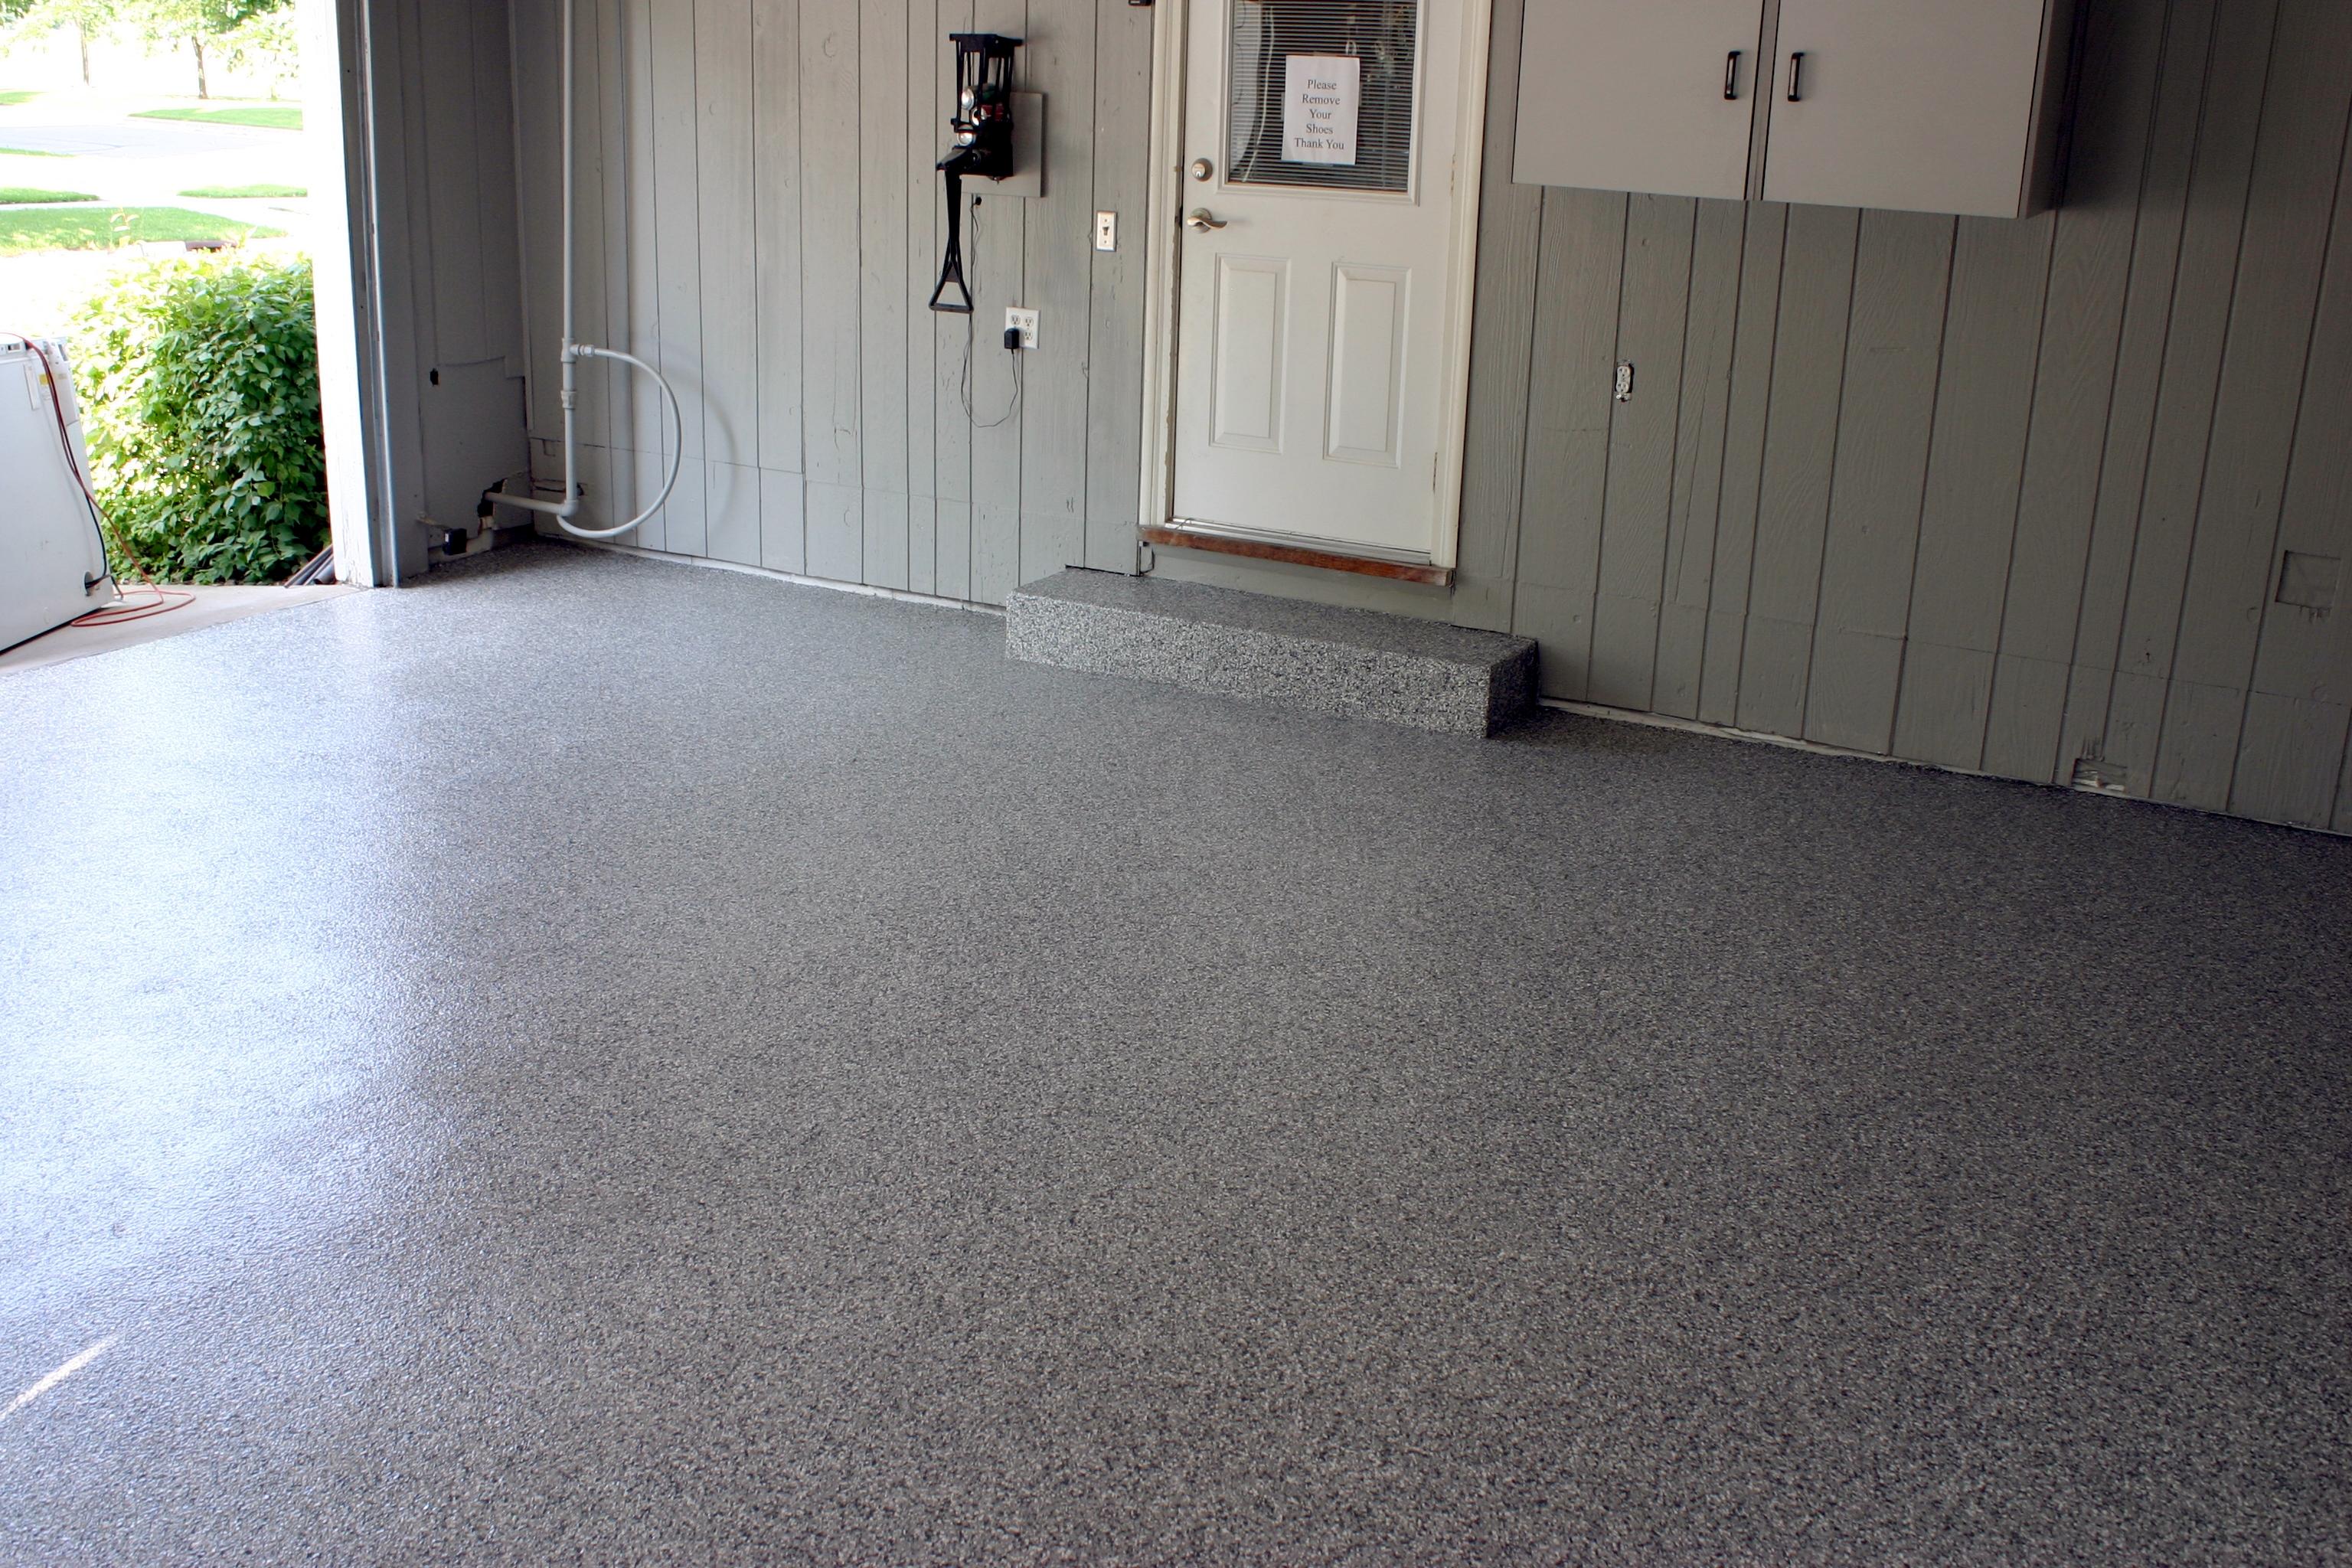 Polytek-coated garage floor